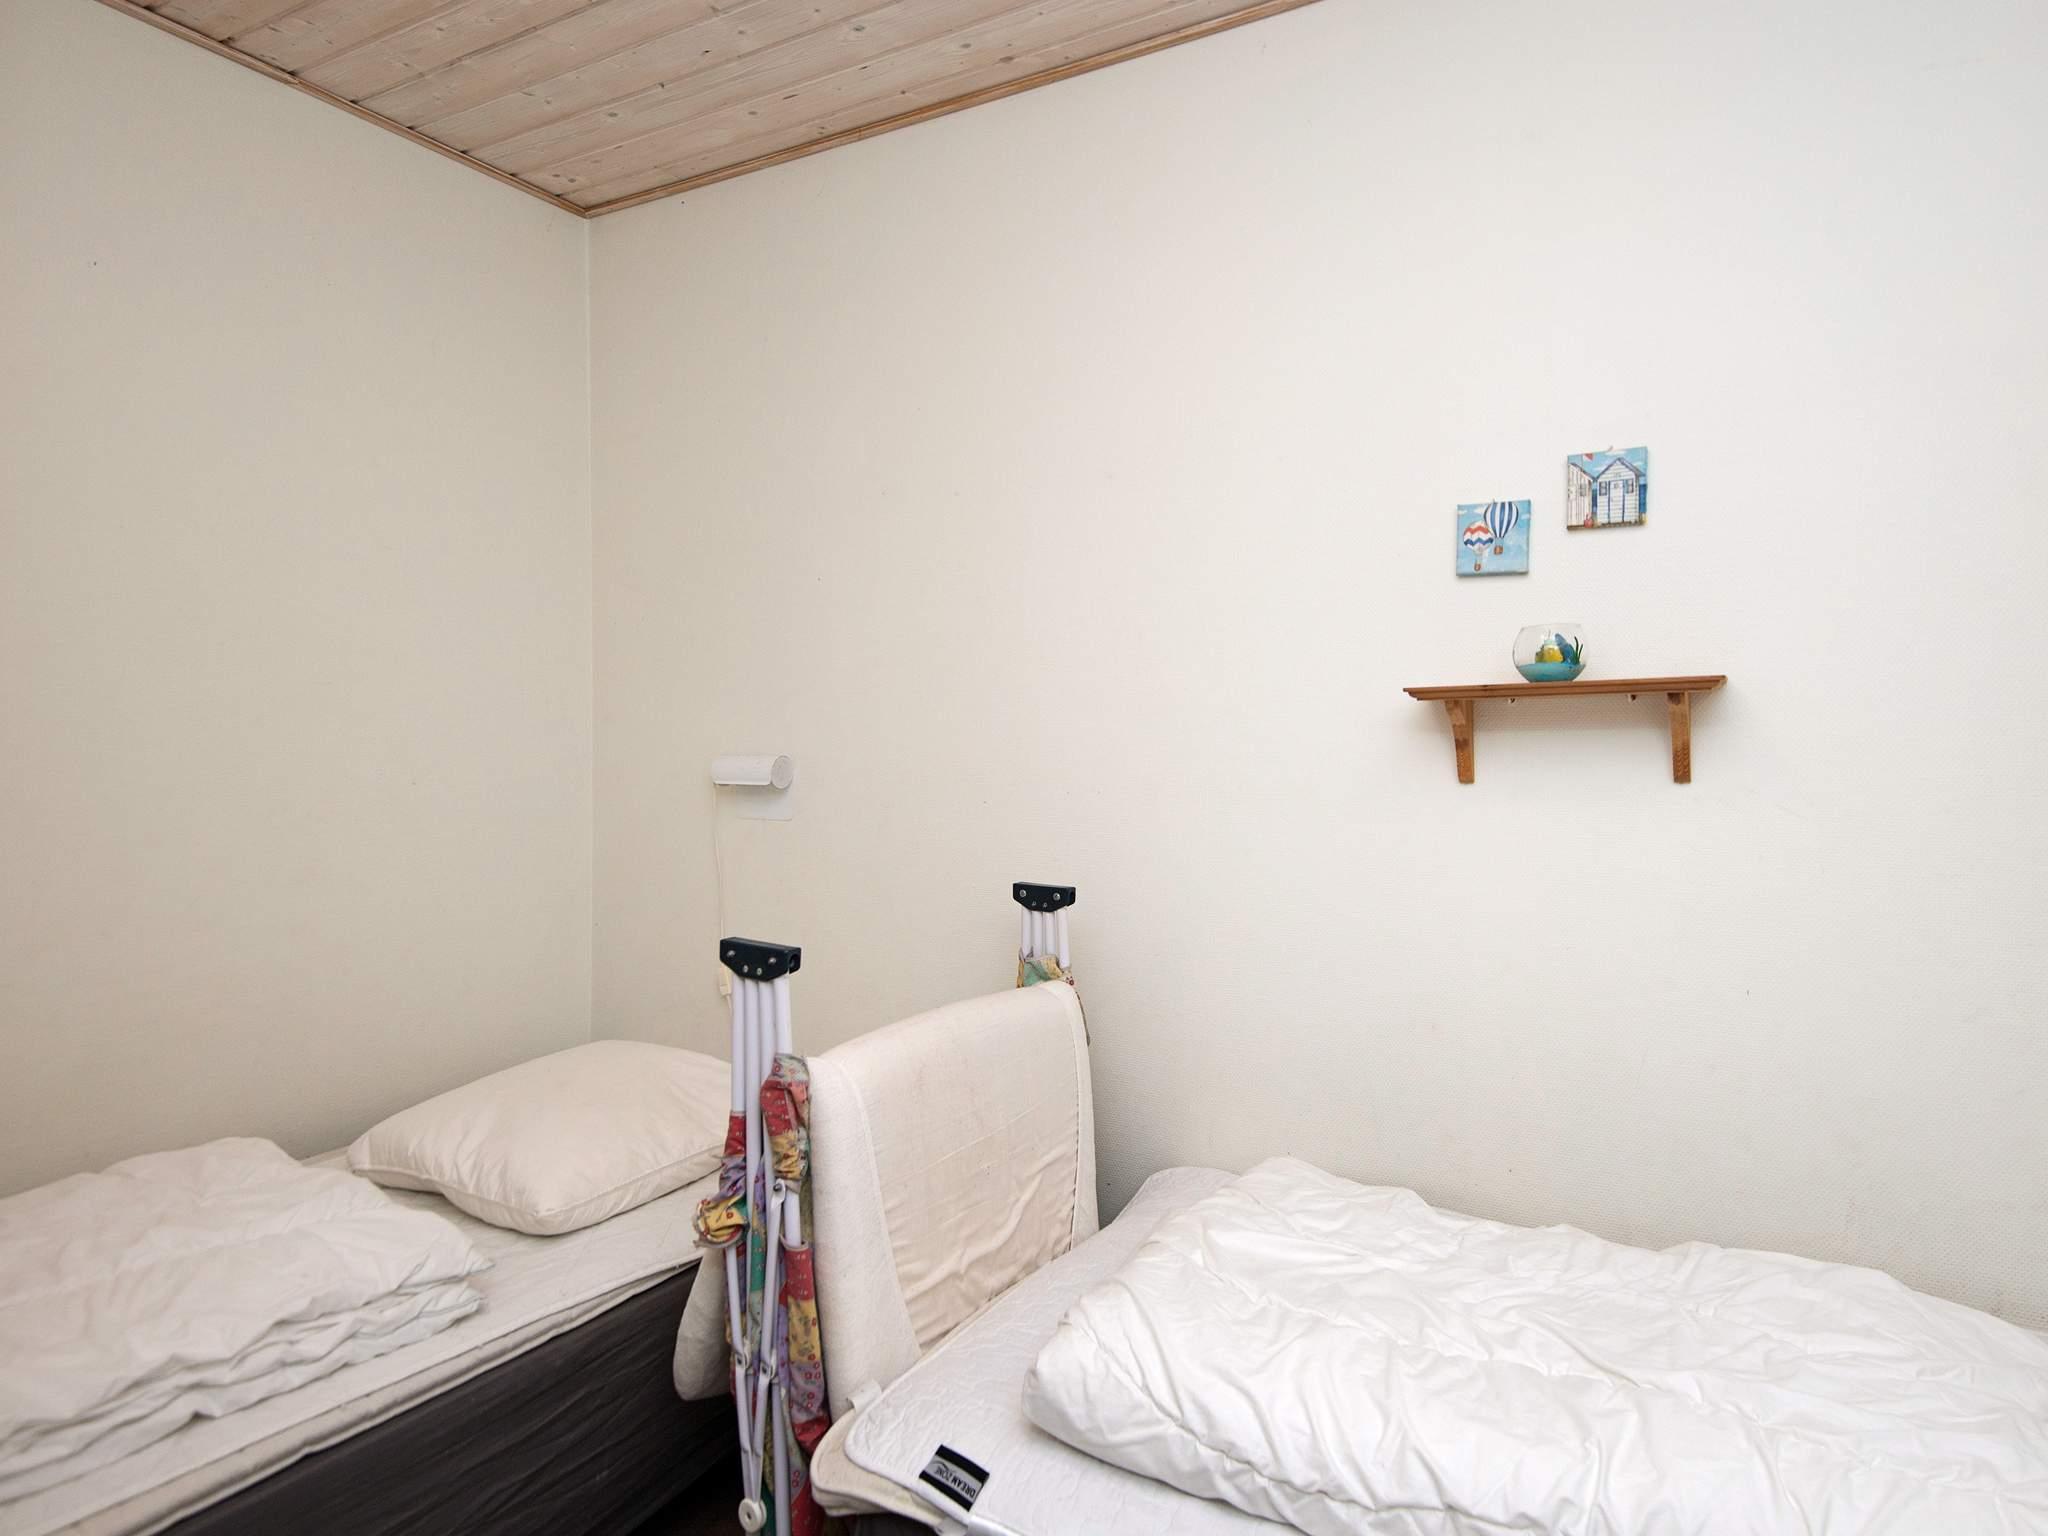 Ferienhaus Arrild (730074), Arrild, , Südwestjütland, Dänemark, Bild 13